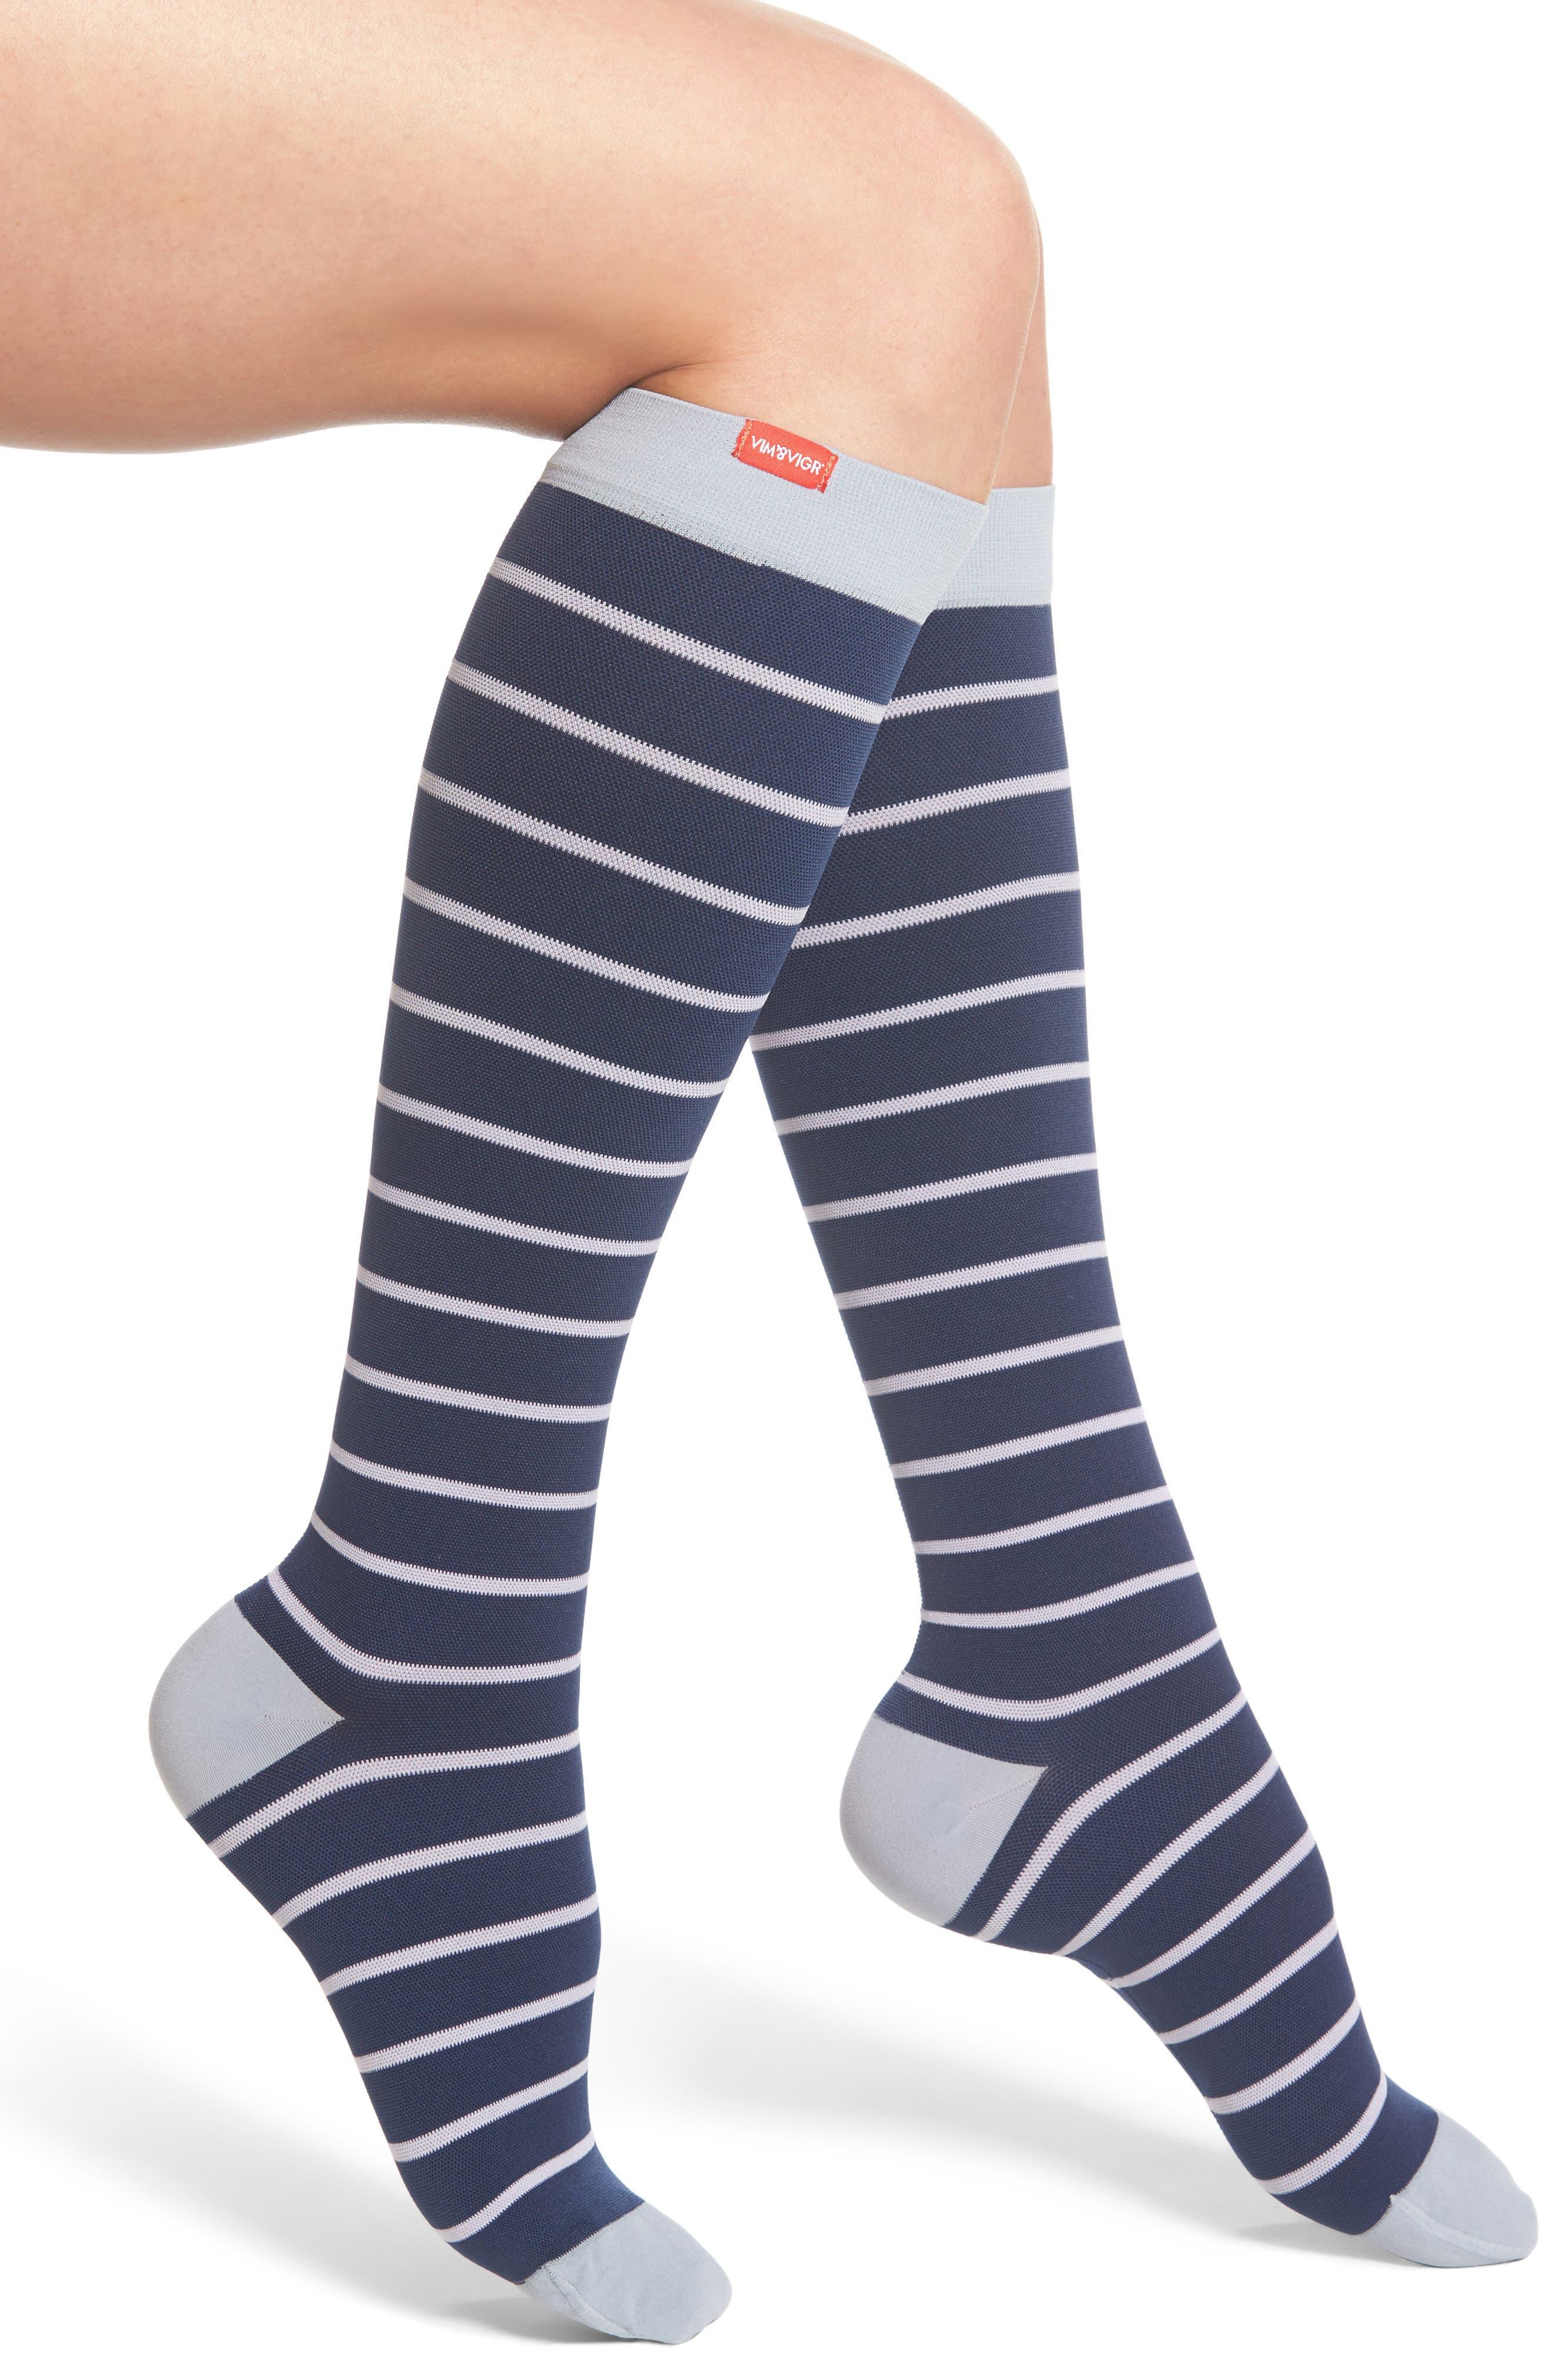 Nautical Stripe Graduated Compression Trouser Socks,                         Main,                         color, Blue/ Lavender